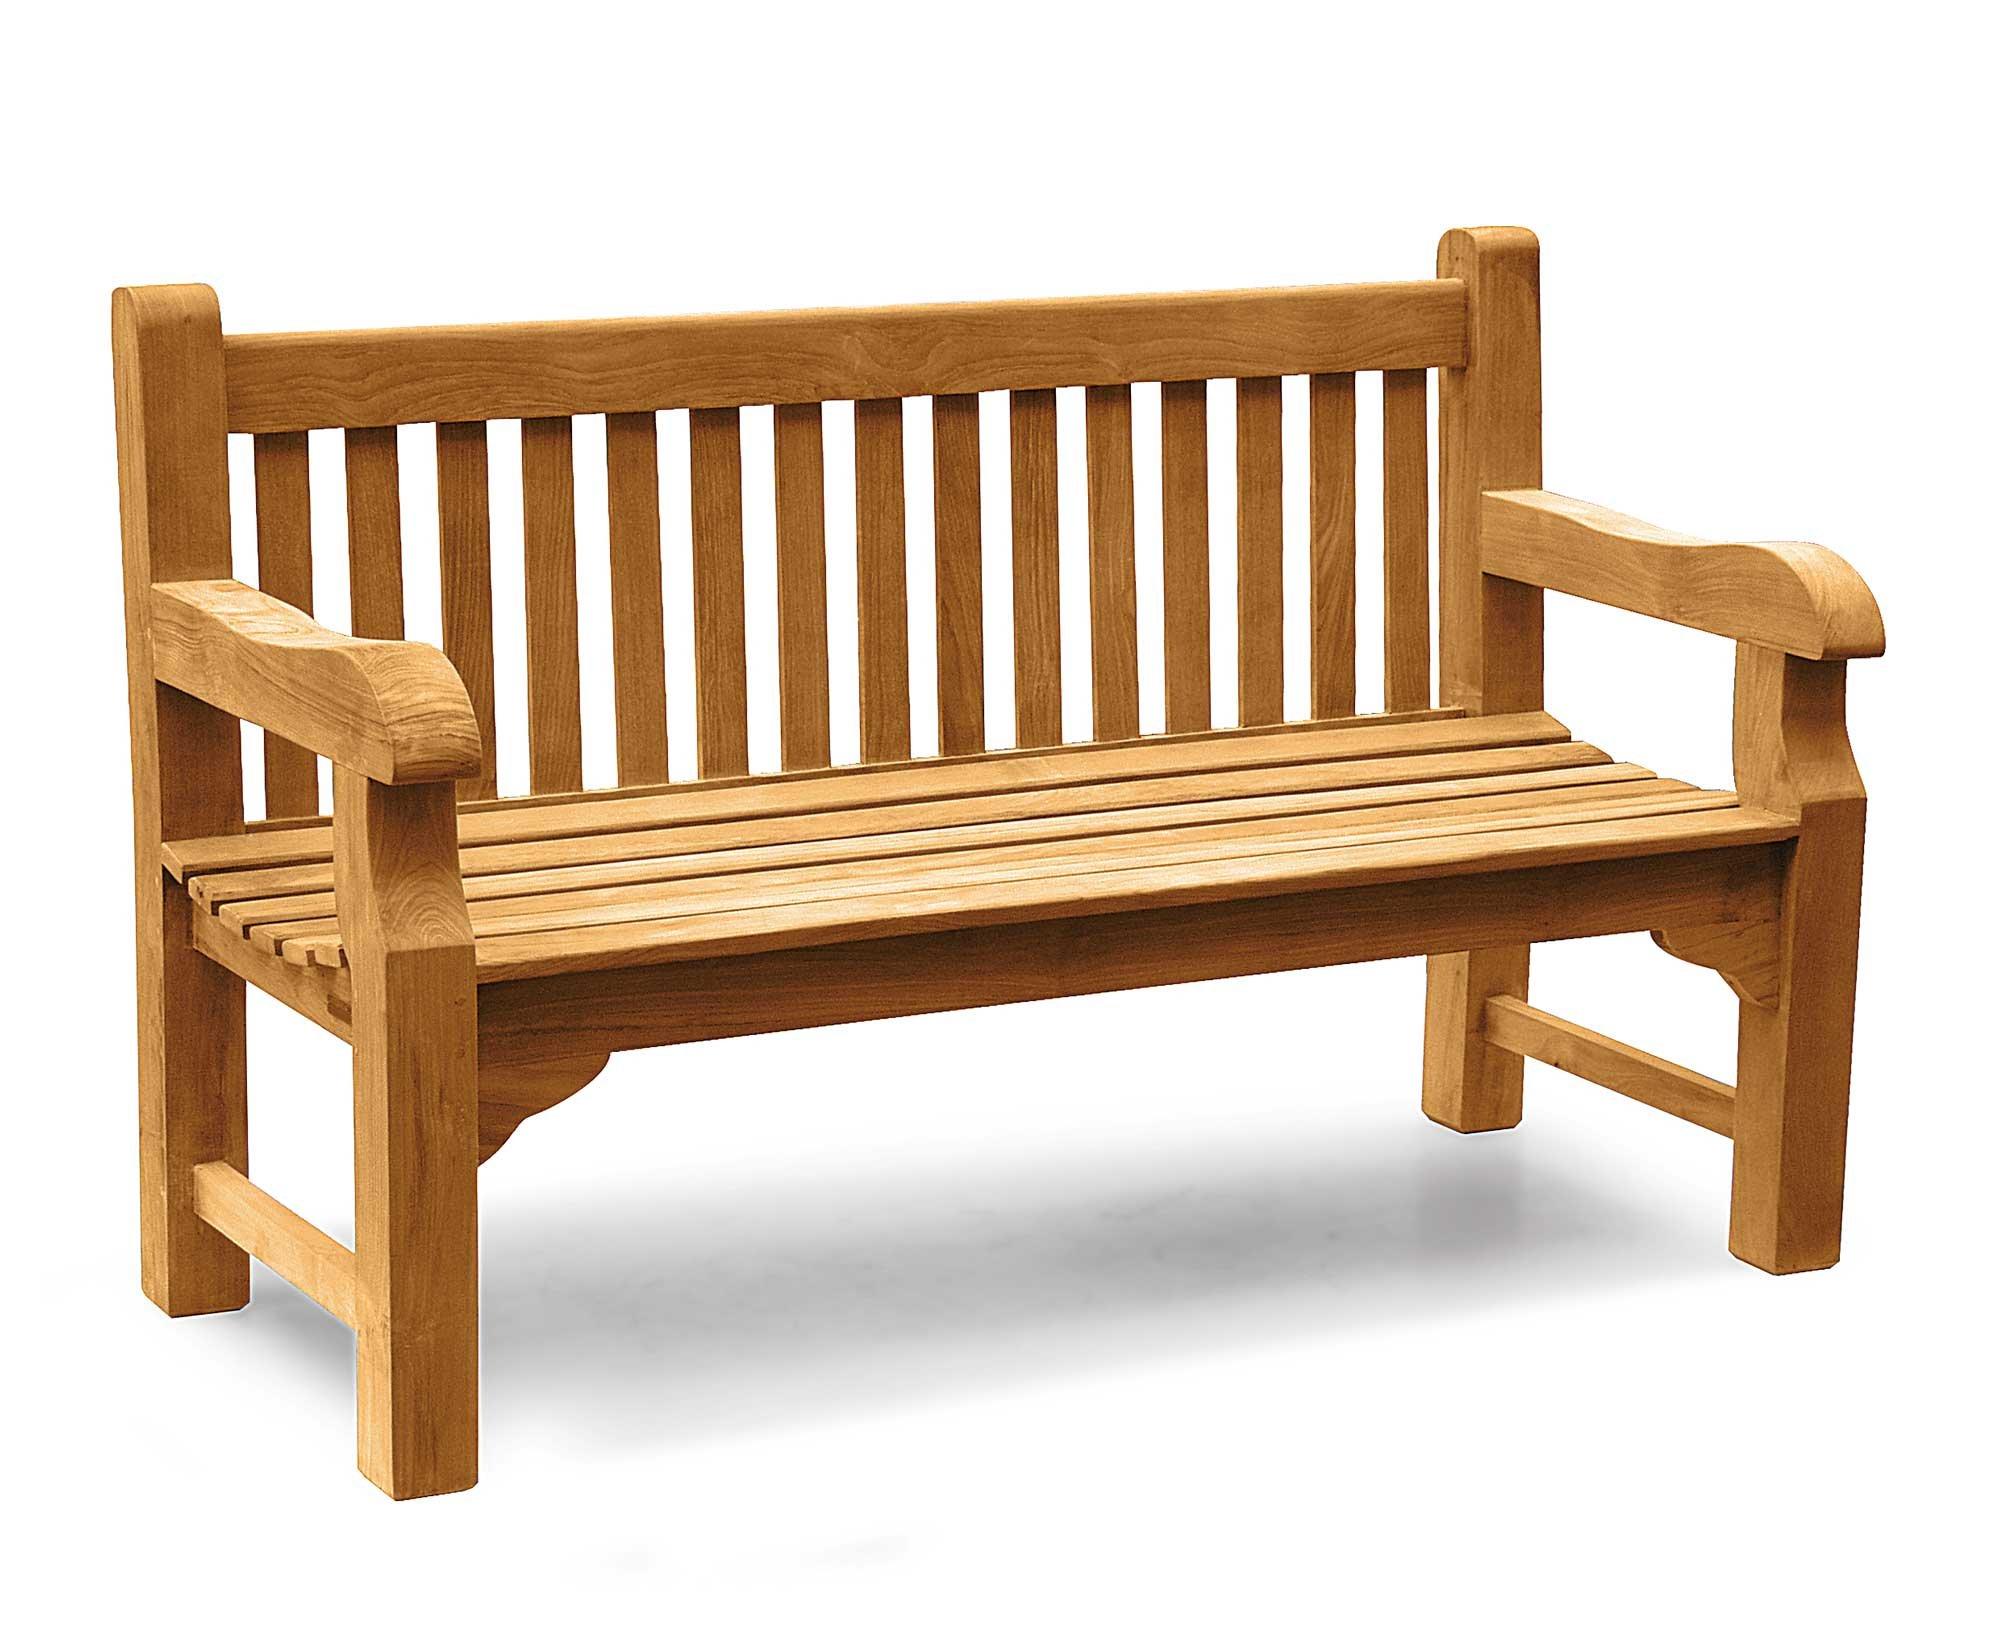 Incredible Jati Gladstone Teak Park 3 Seater Garden Bench 1 5M 5Ft Garden Bench Brand Quality Value Lamtechconsult Wood Chair Design Ideas Lamtechconsultcom